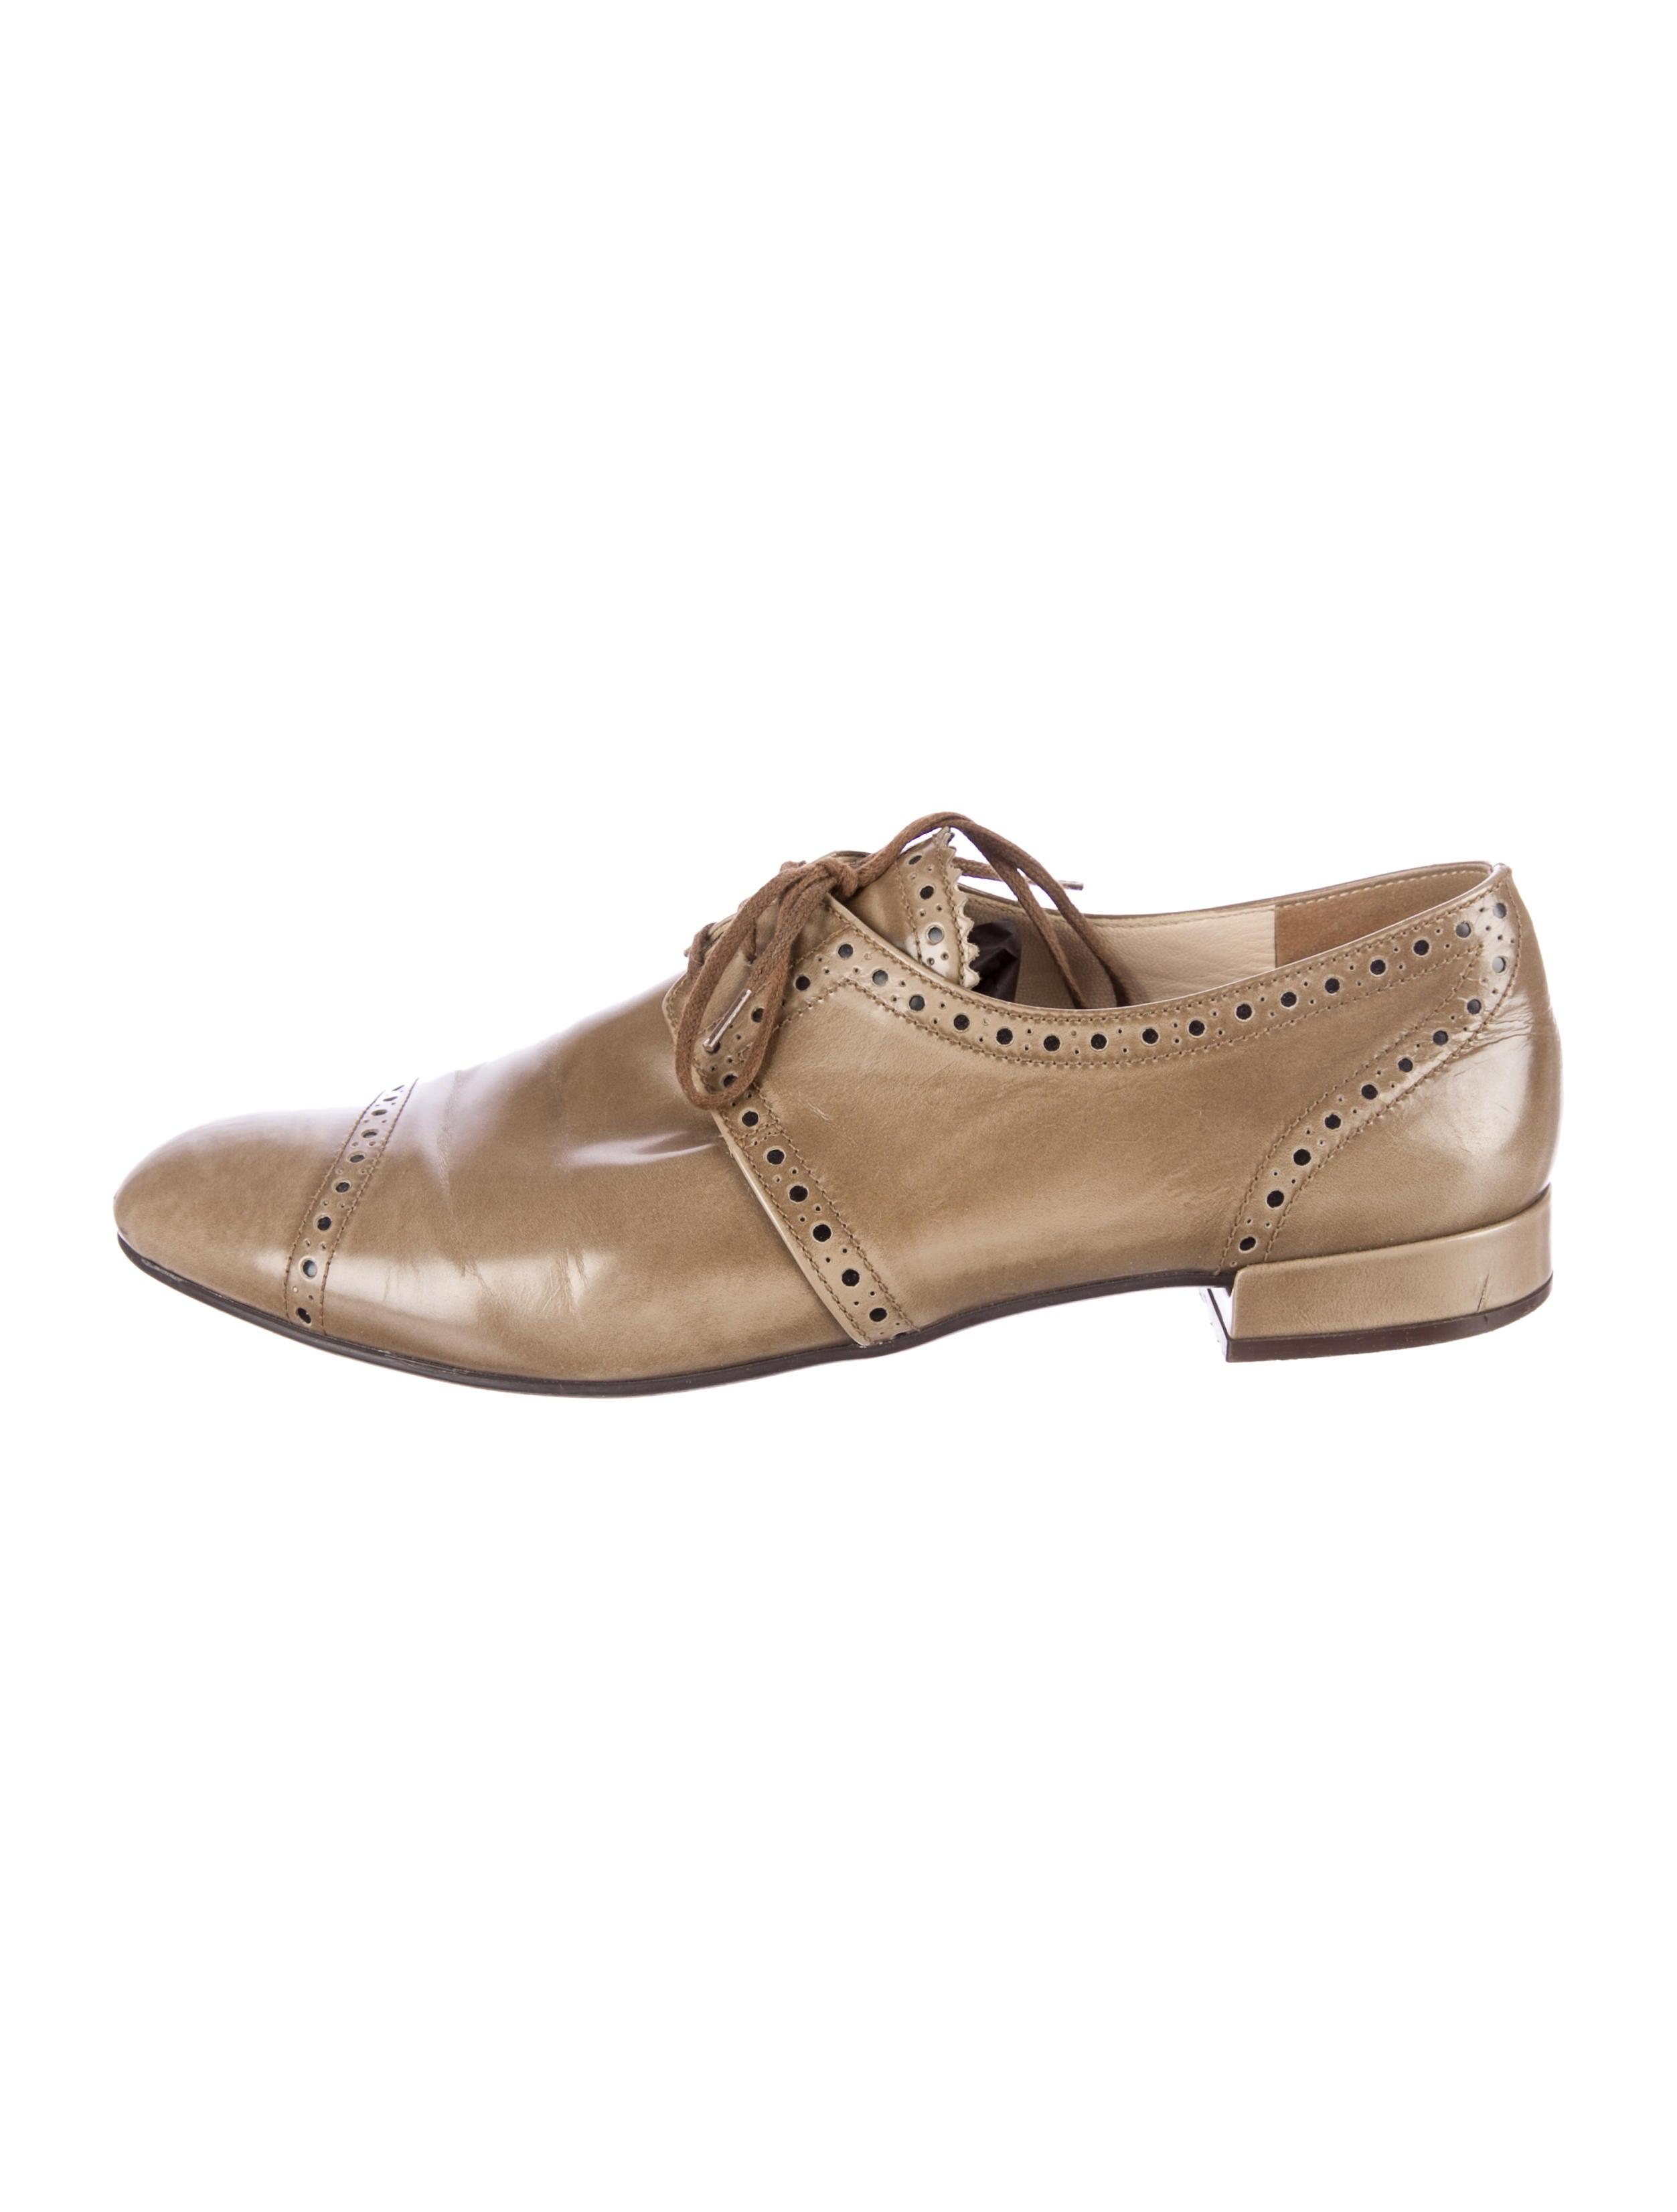 Prada Oxfords - Shoes - PRA61750 | The RealReal